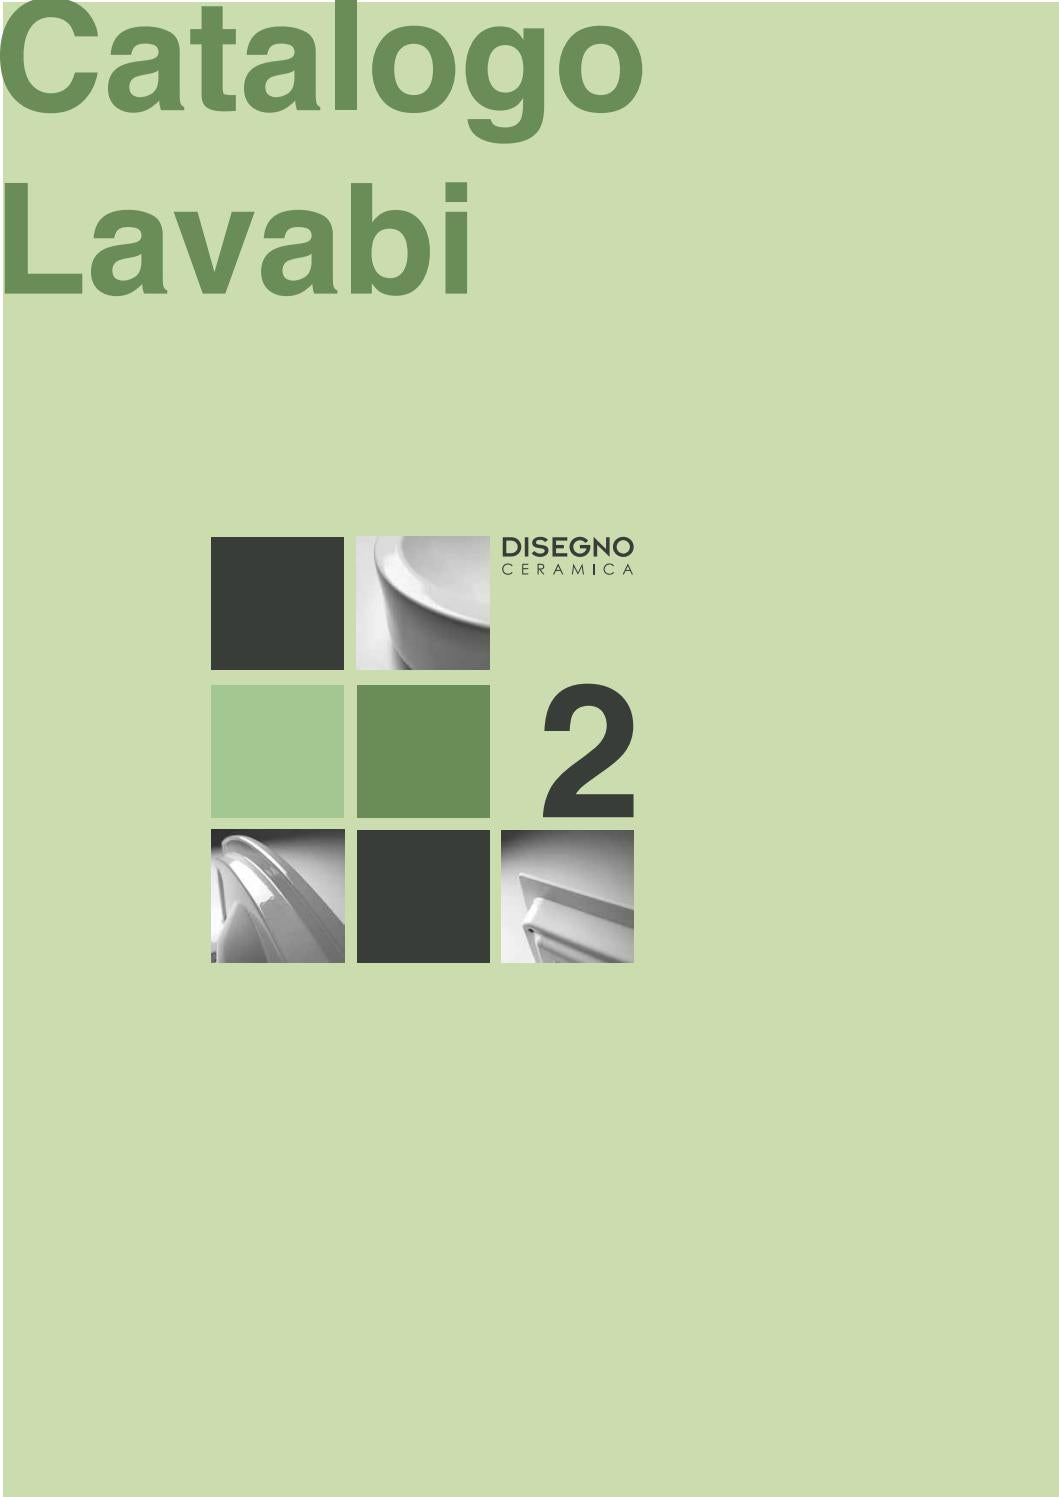 Disegno Ceramica Lavabi.Catalogue Lavabi 2 By Bathroom Gallery Issuu